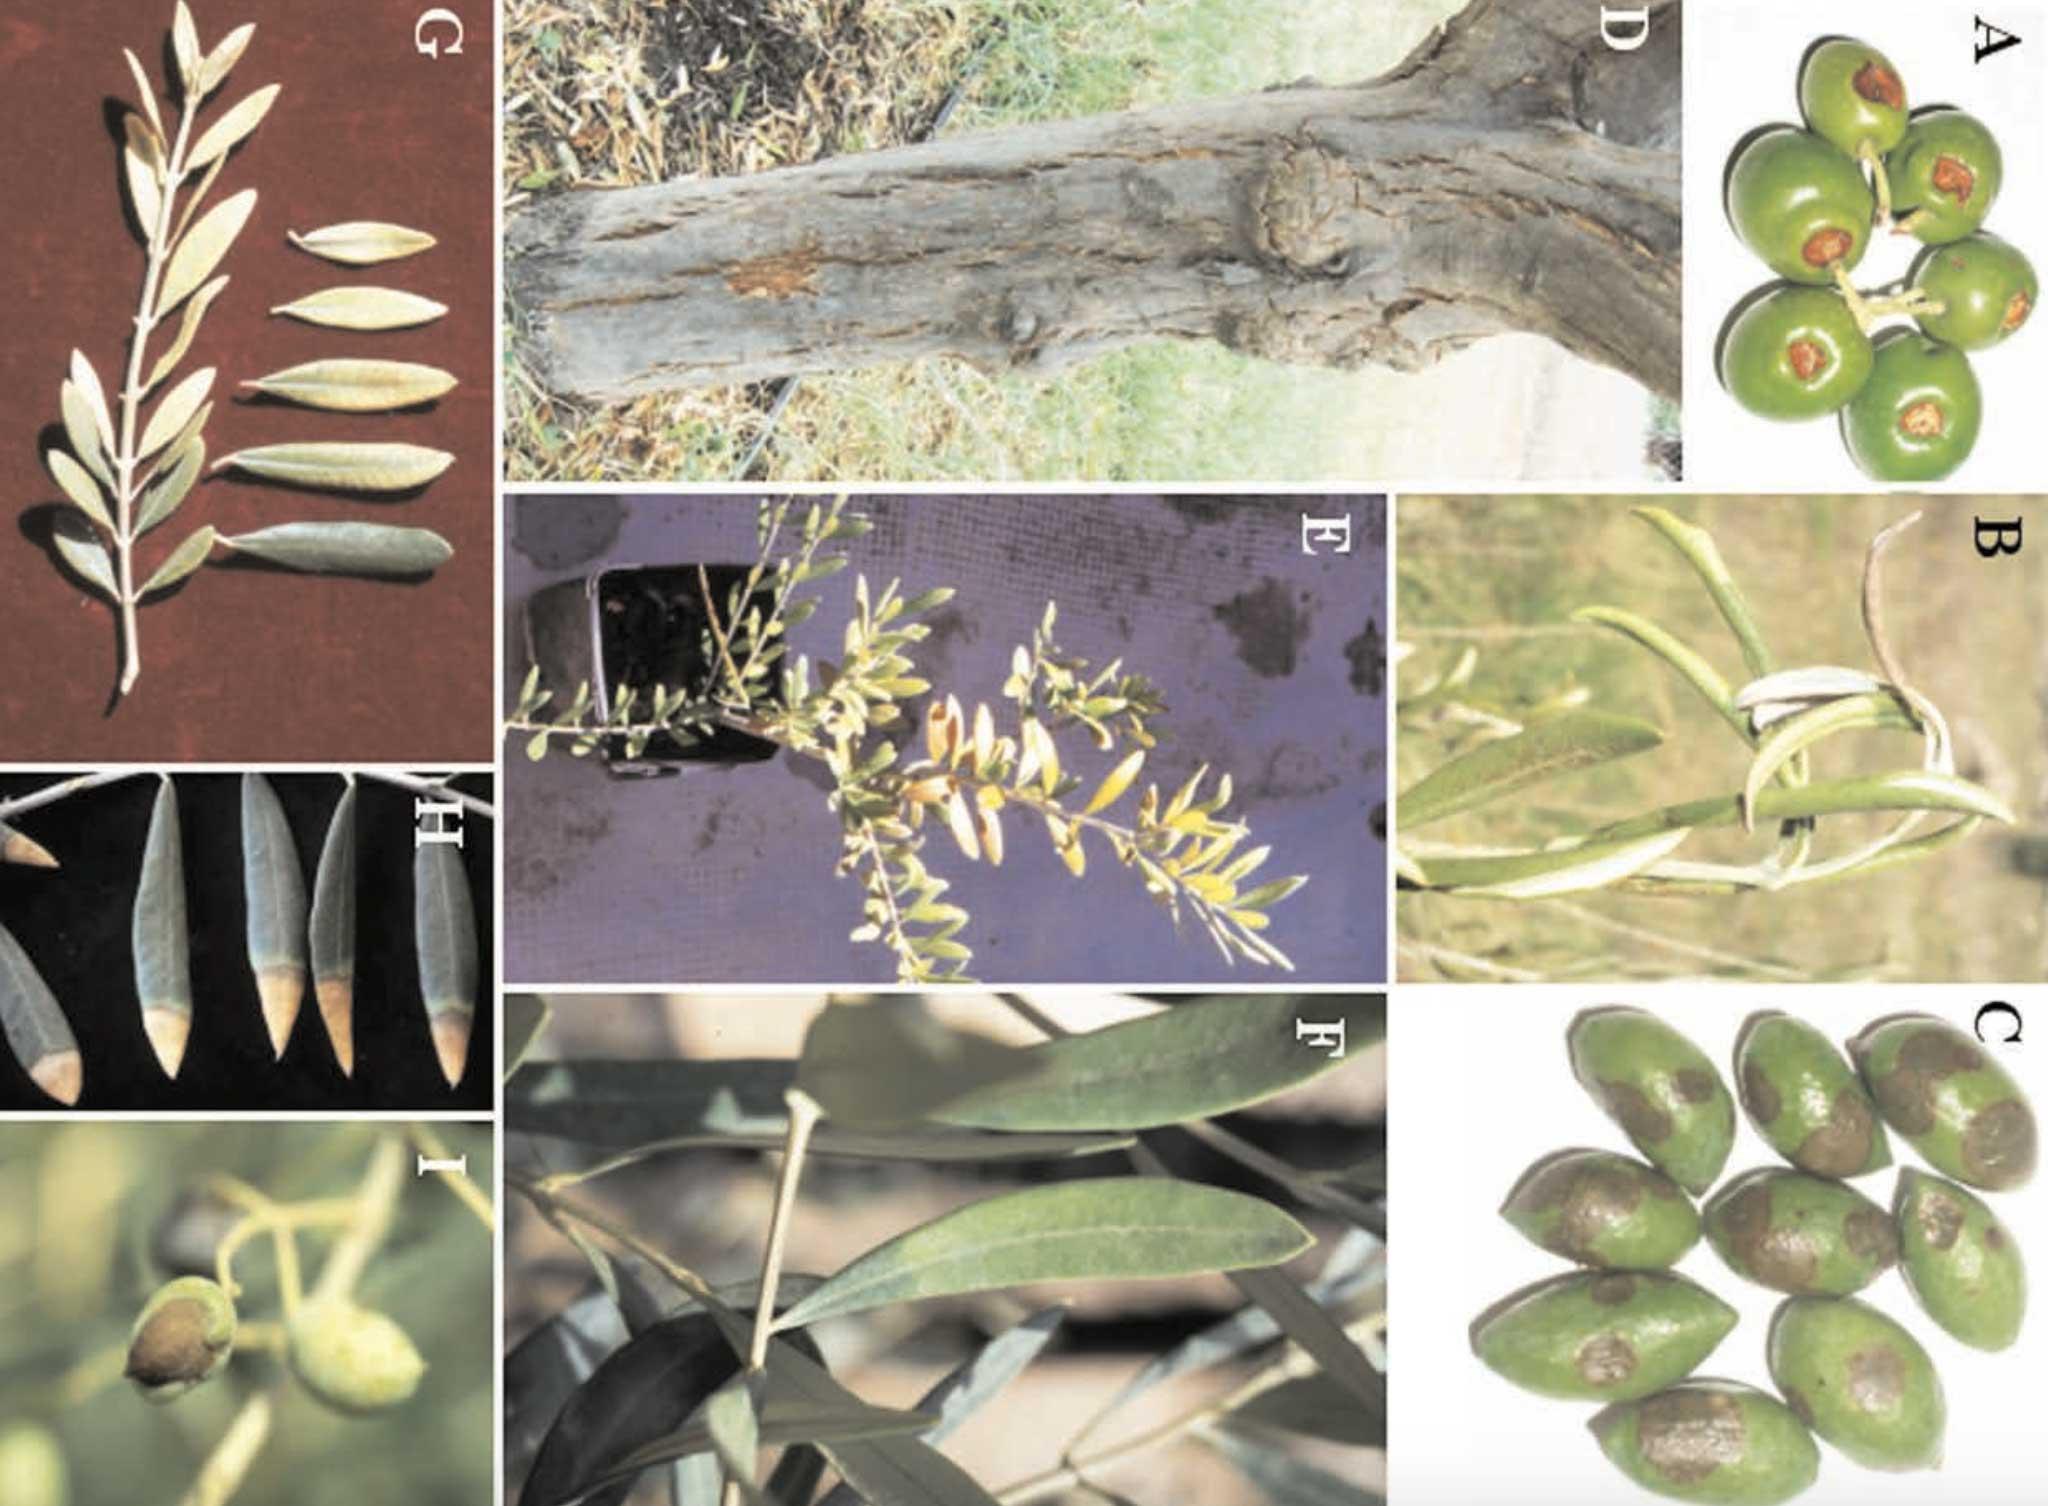 Abiotic Diseases of Olive